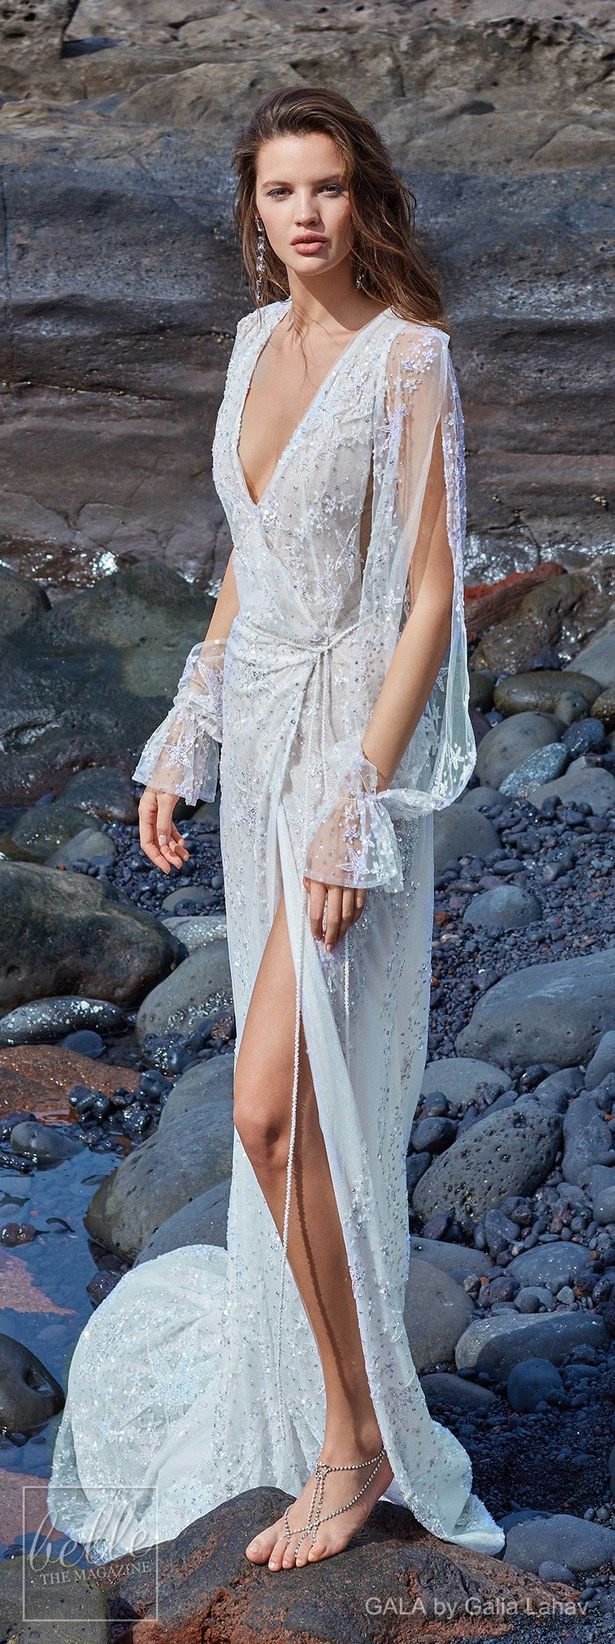 Gala of Galia Lahav wedding dress collection